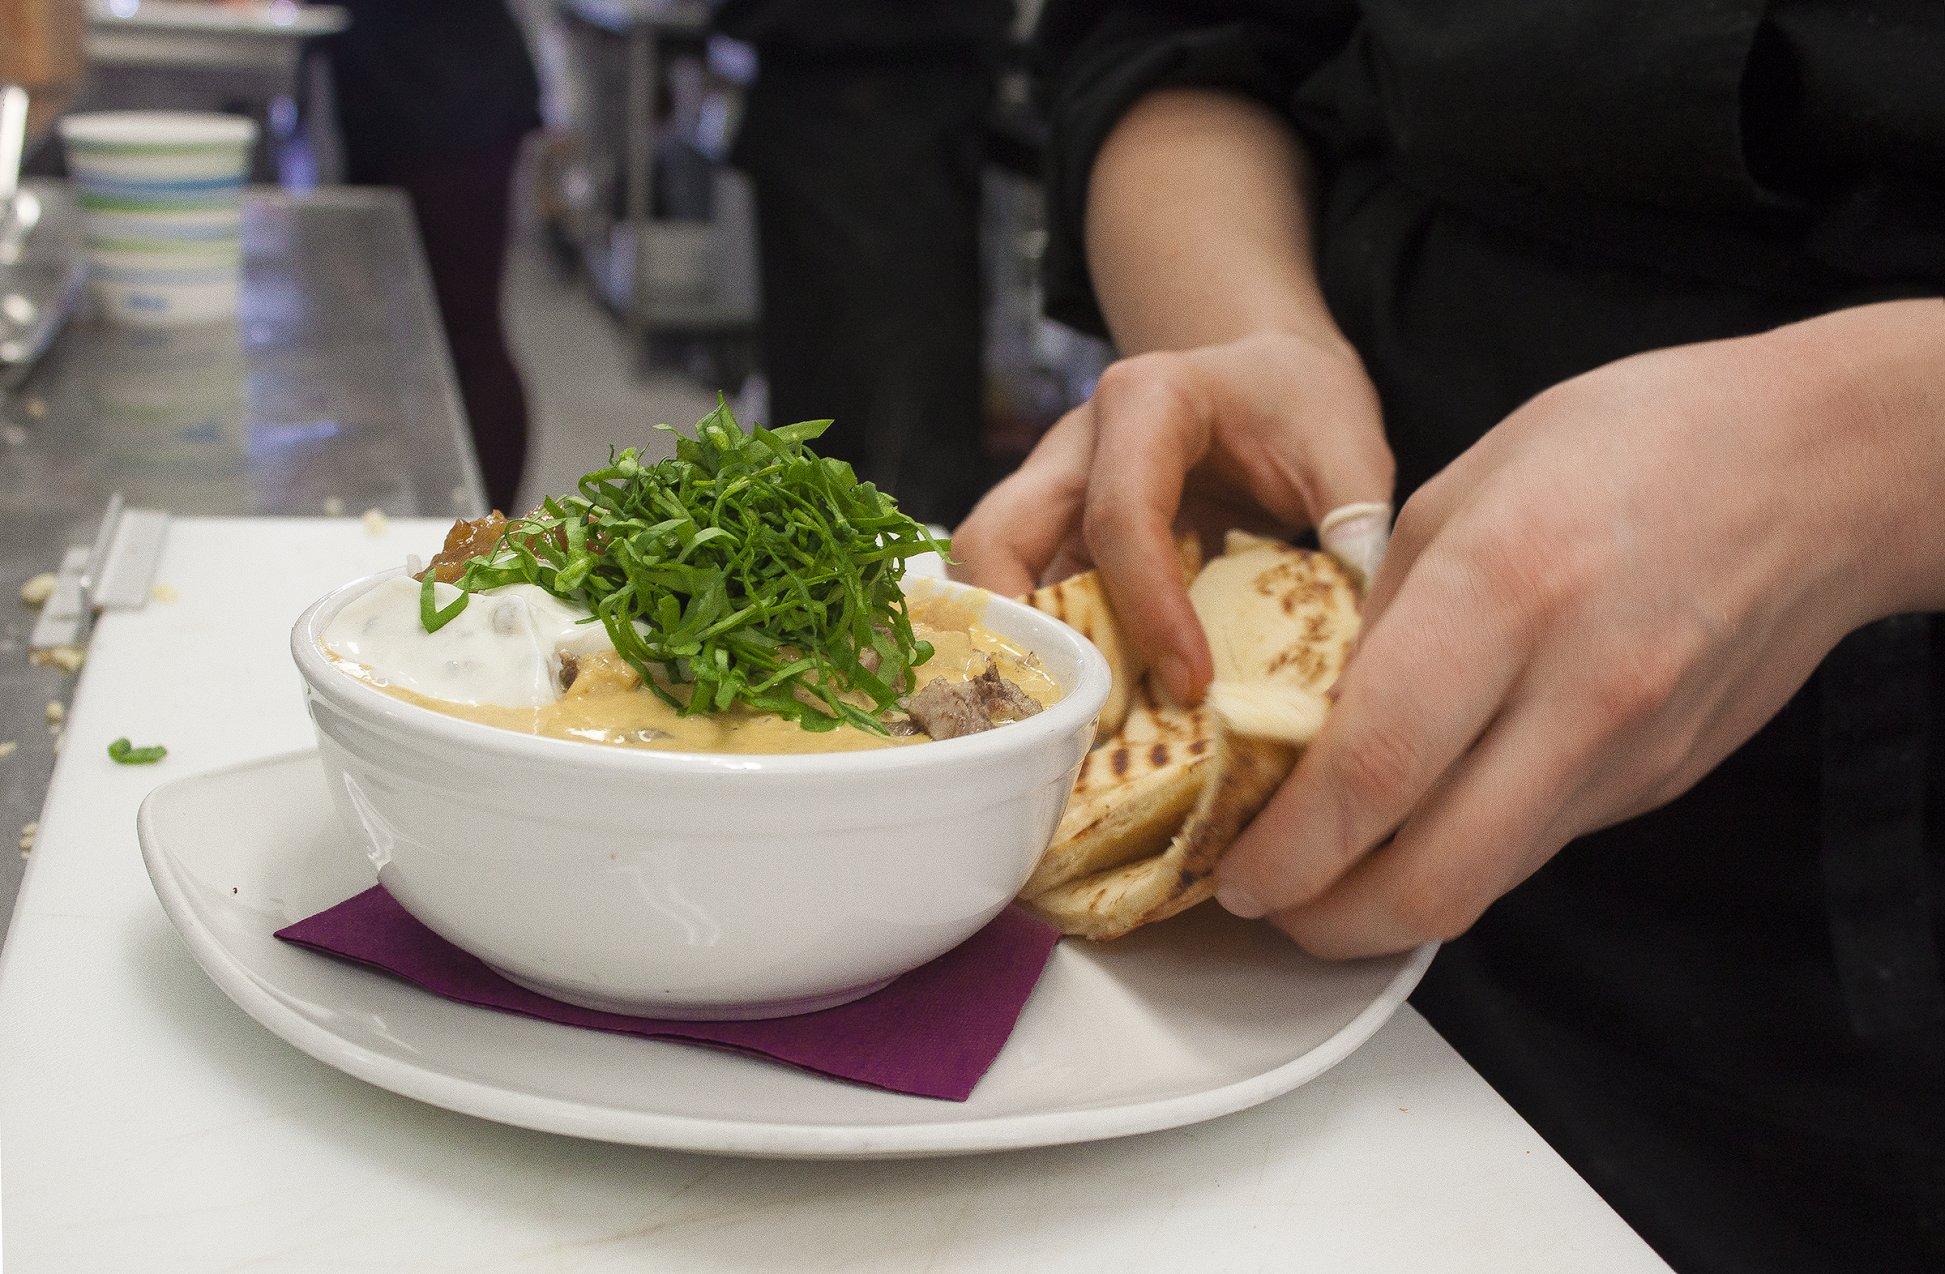 Award-winning food from Whitewater Ski Resort's kitchen staff in Nelson. Photo: Gina Bégin